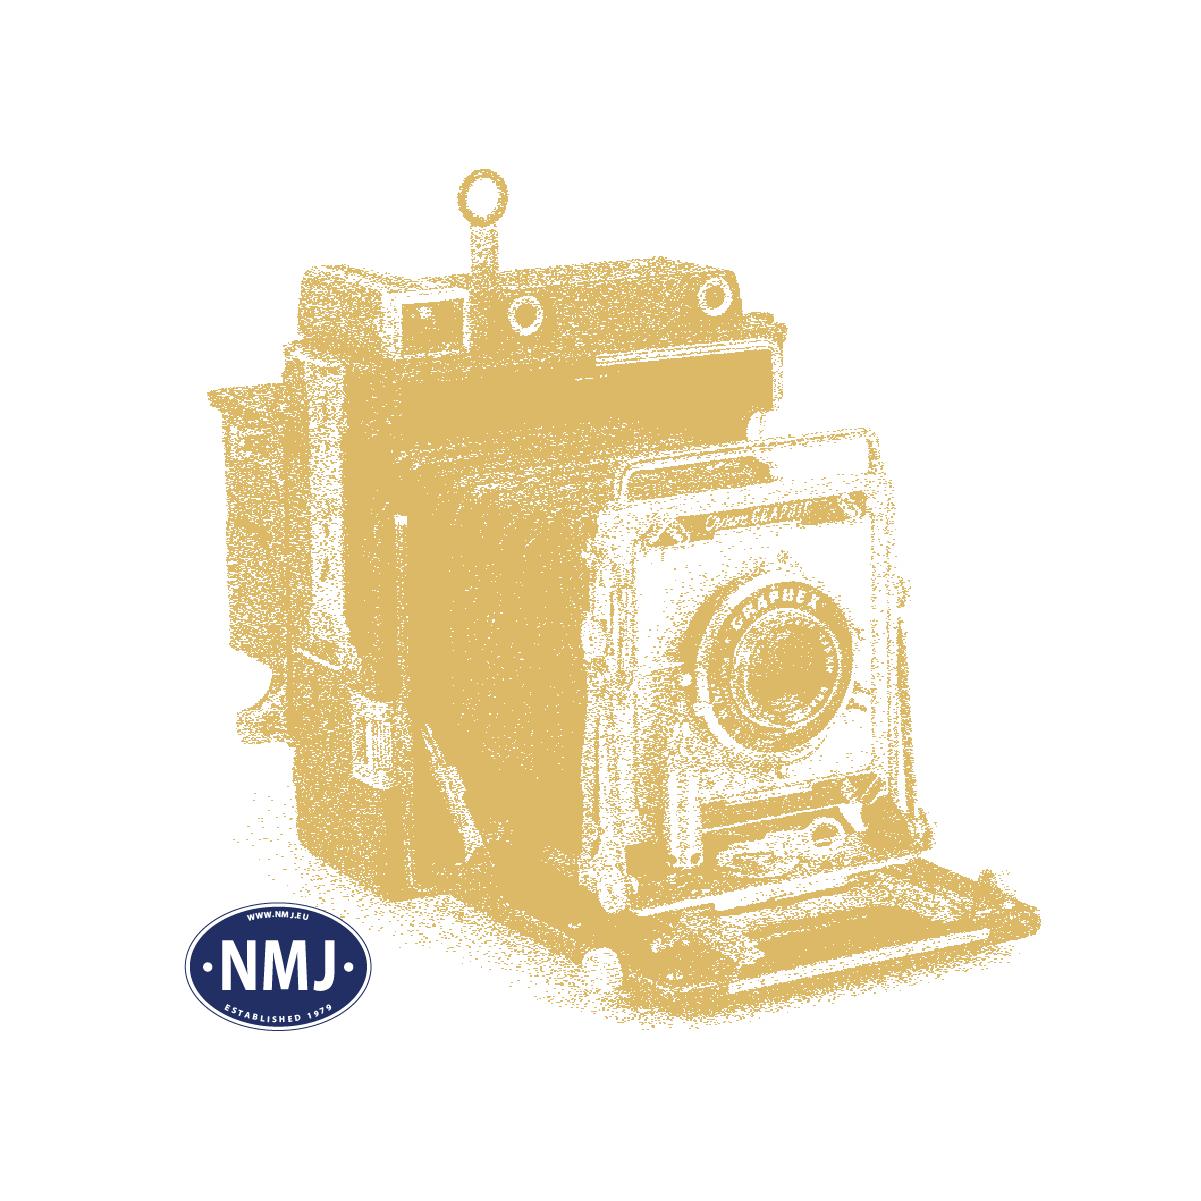 NMJT130.102 - NMJ Topline NSB B3-2 25510 type 3, Gammeldesign